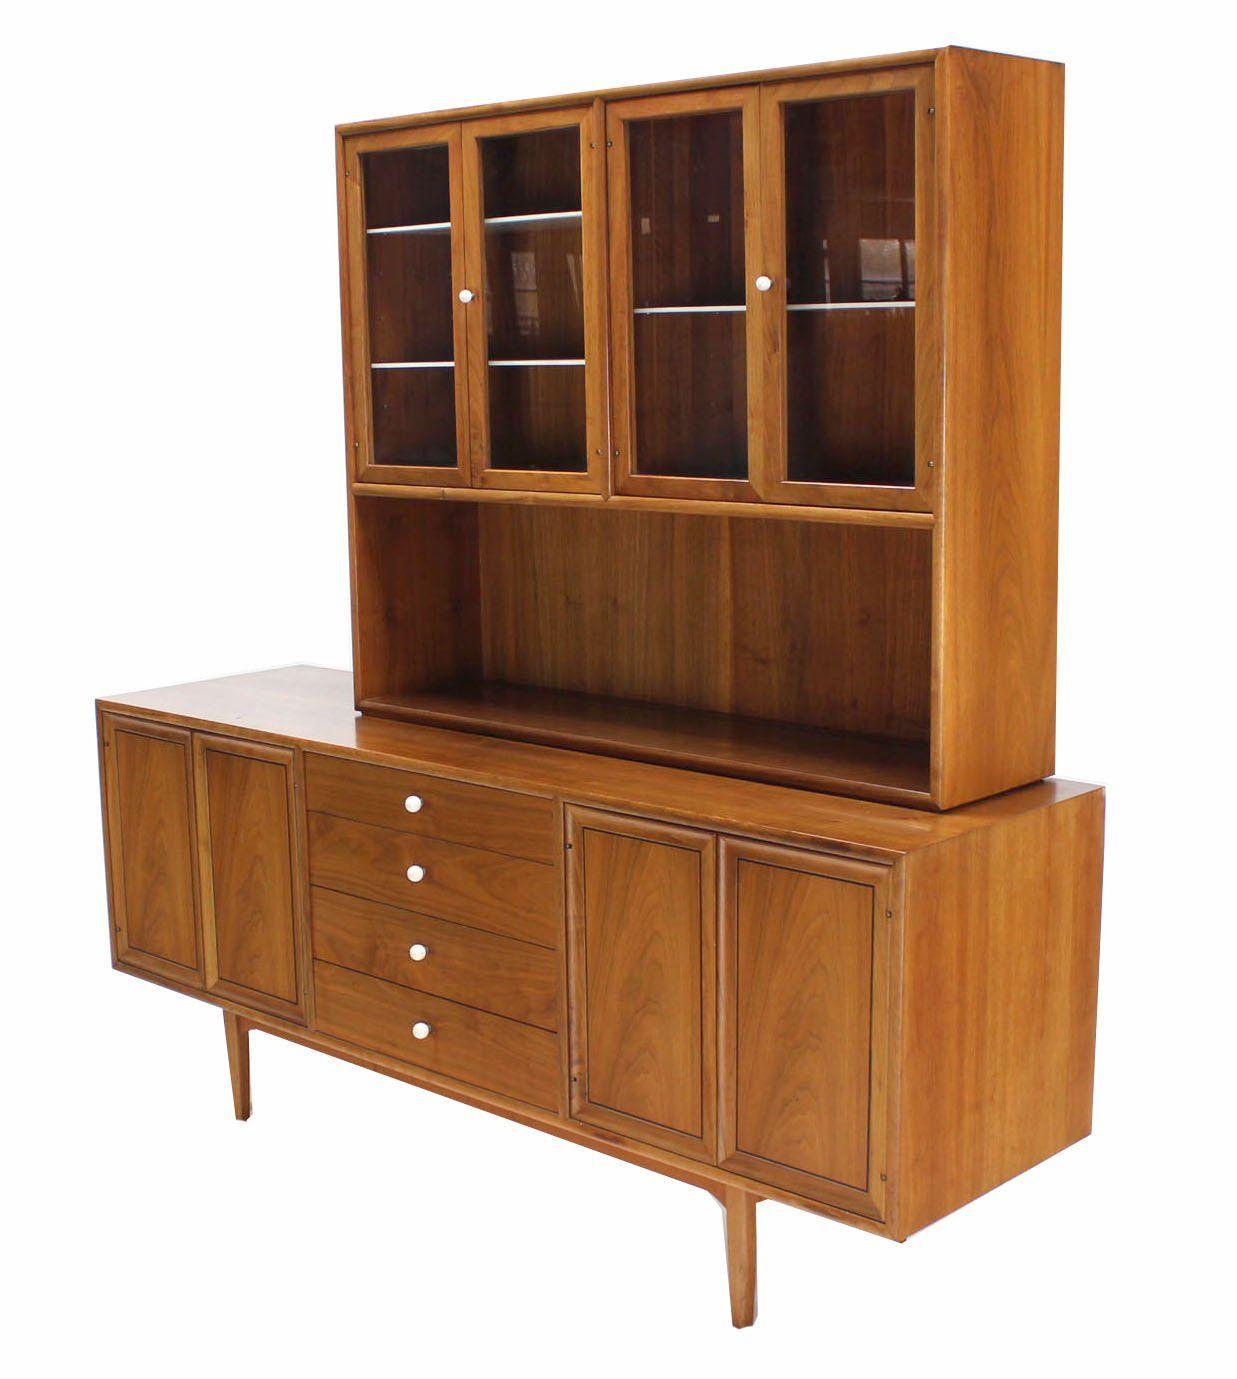 Drexel declaration two part cabinet kitchens